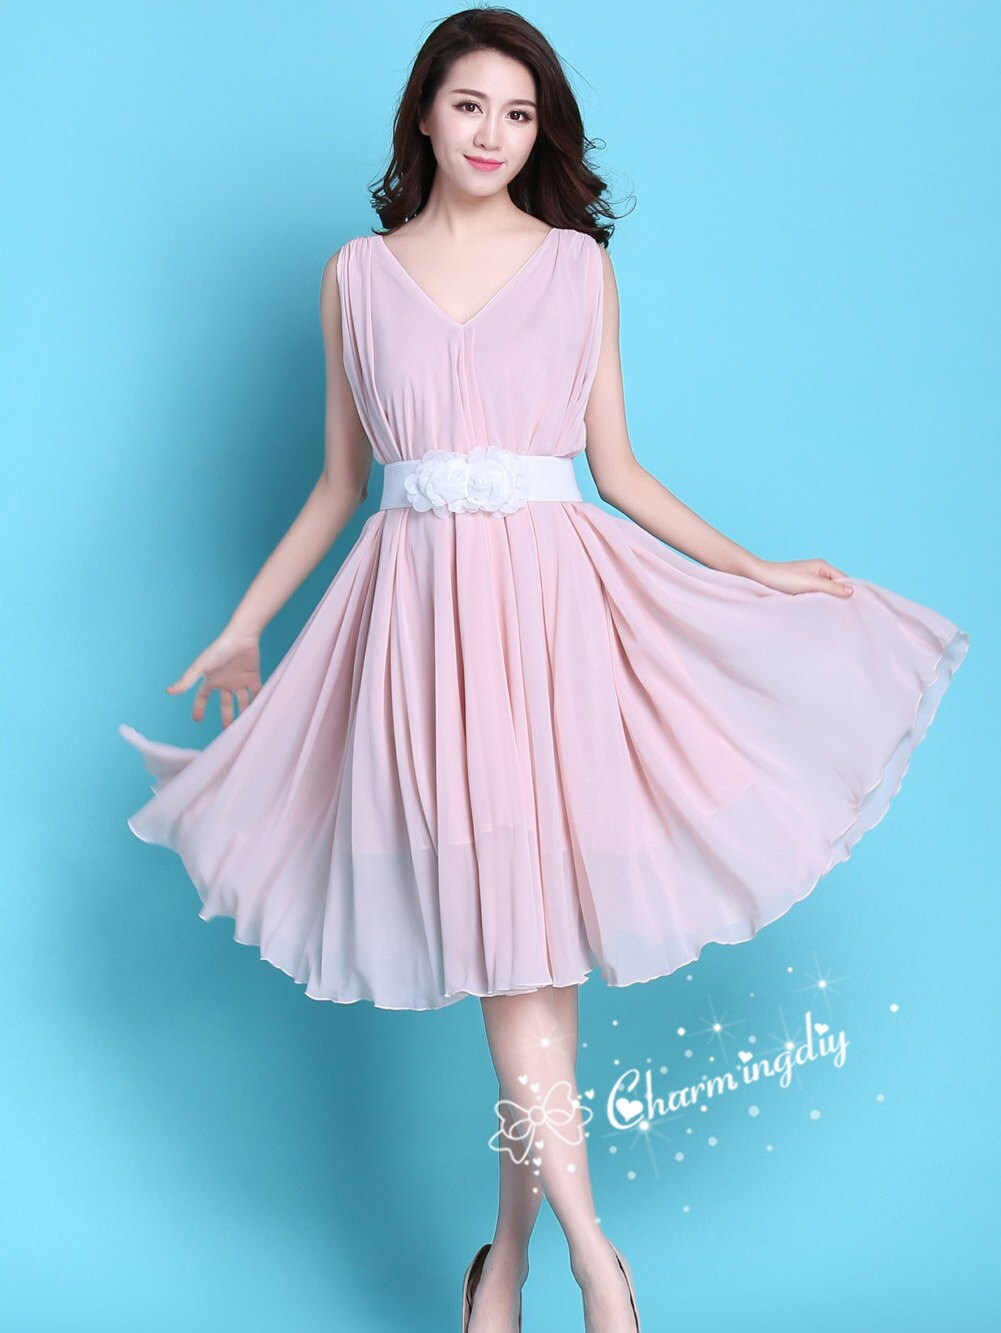 60 colores alta calidad doble rodilla rosa gasa falda vestido